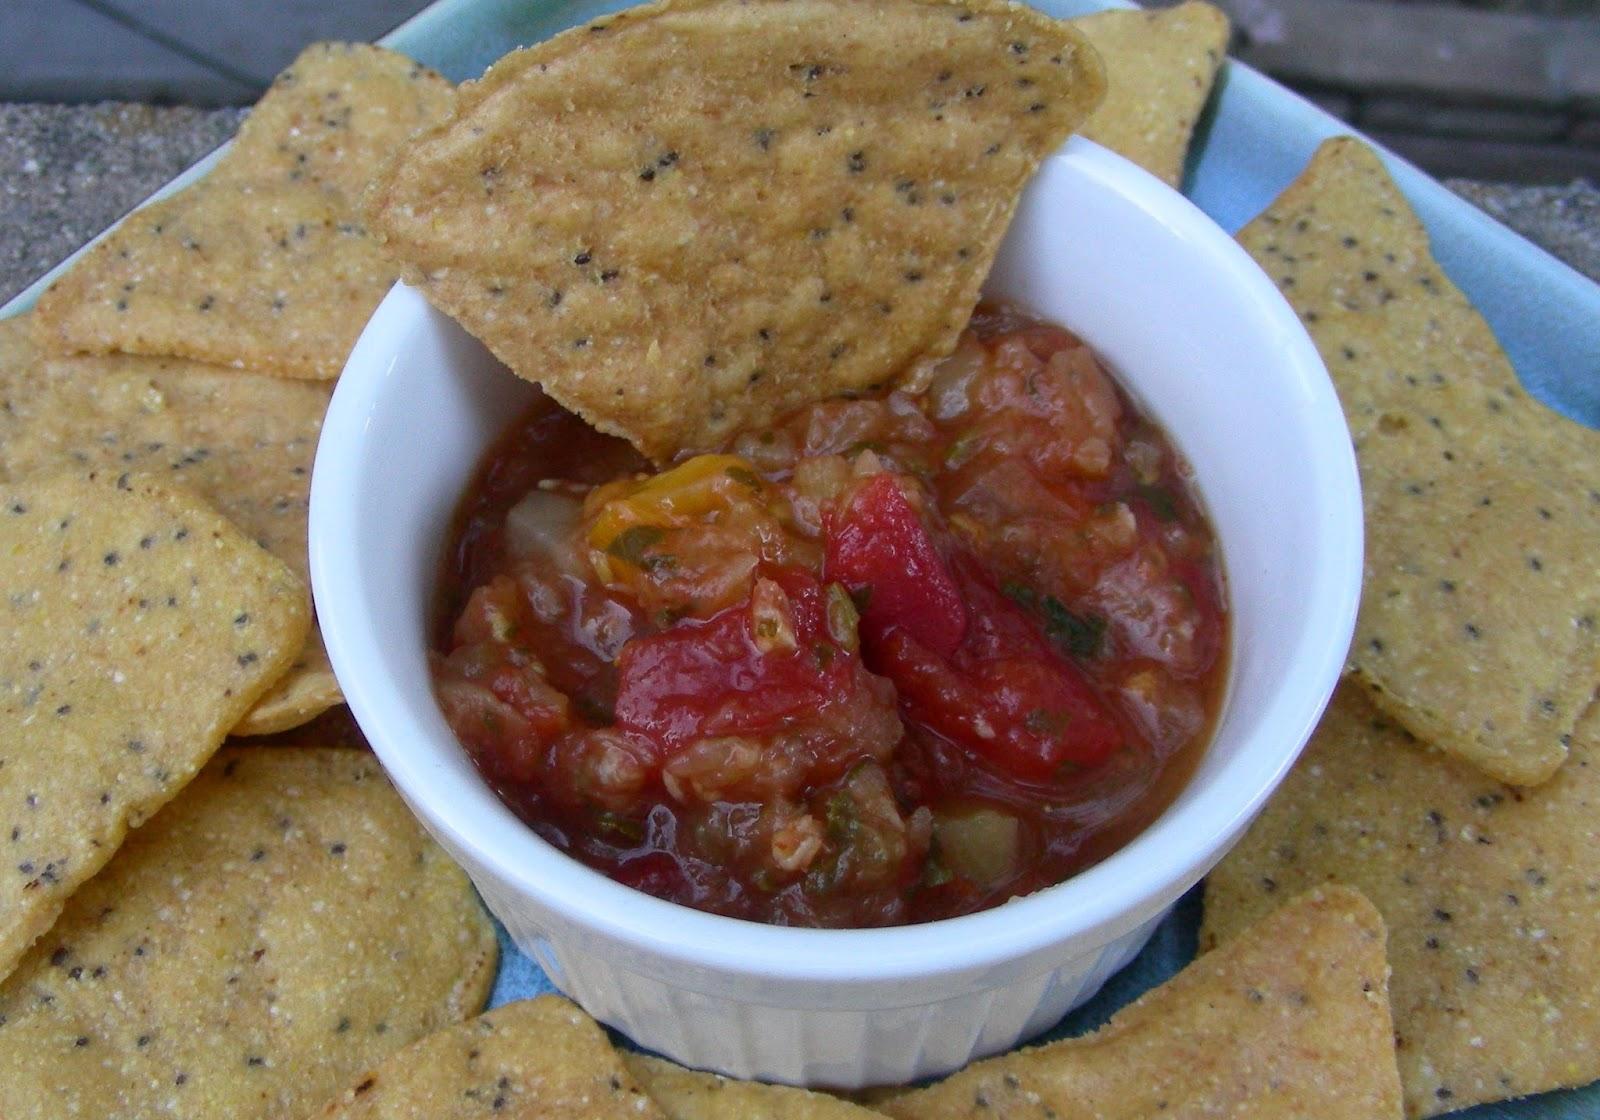 Susan Can Cook: Pineapple Tomato Salsa - Success!